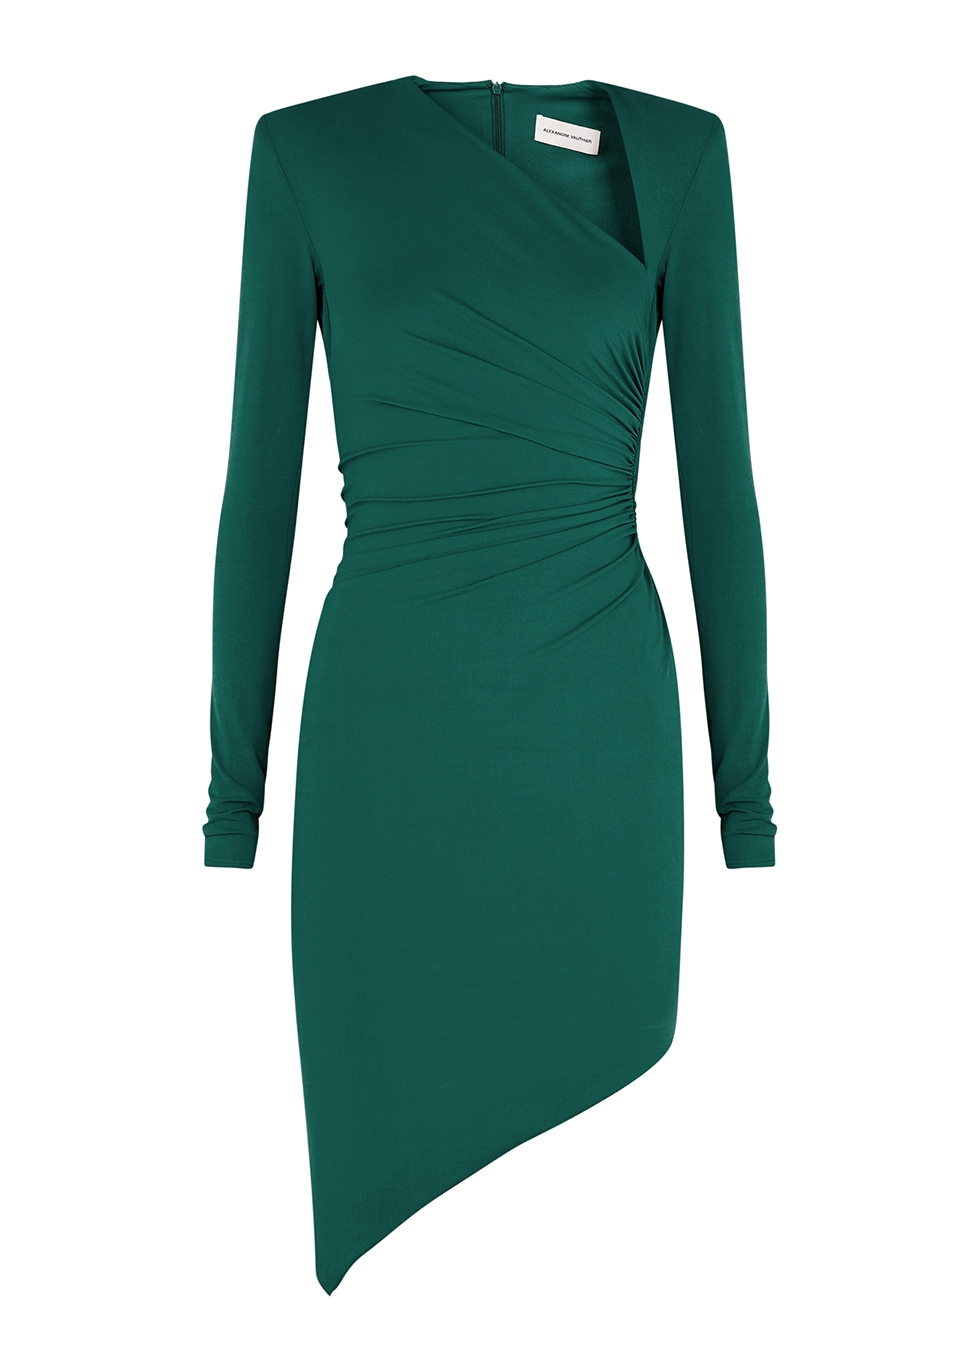 Green asymmetric mini dress